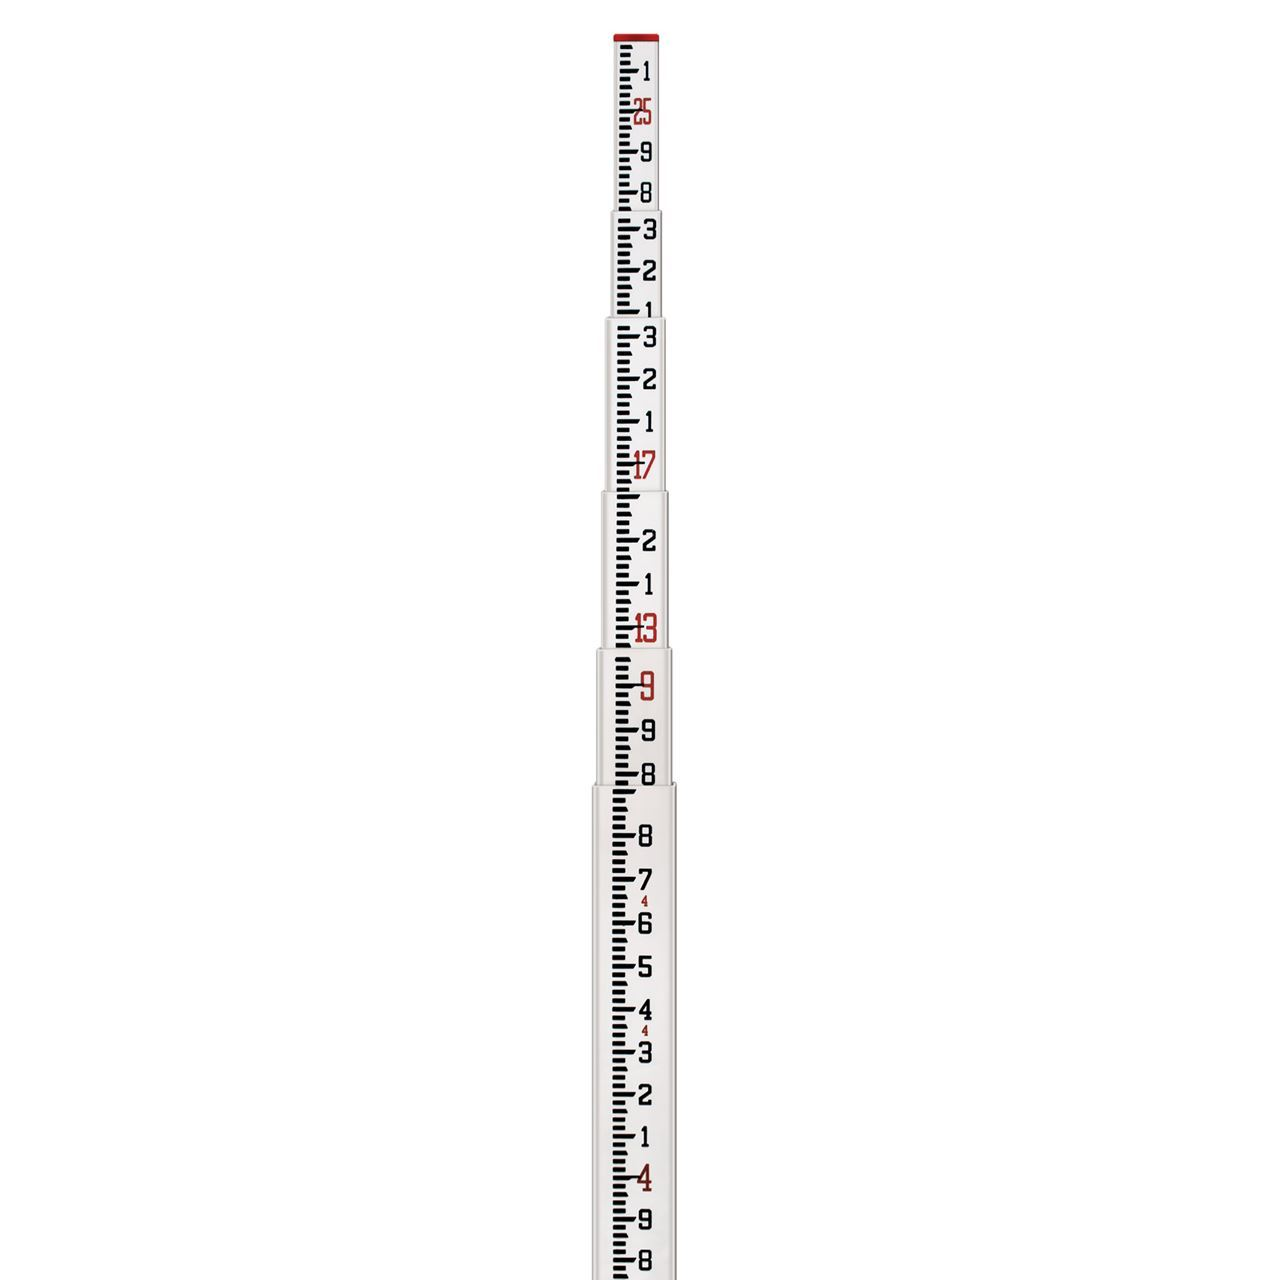 Imagen de SitePro SCR 25-ft Fiberglass Leveling Rod (CR)-10ths, 11-SCR25-T